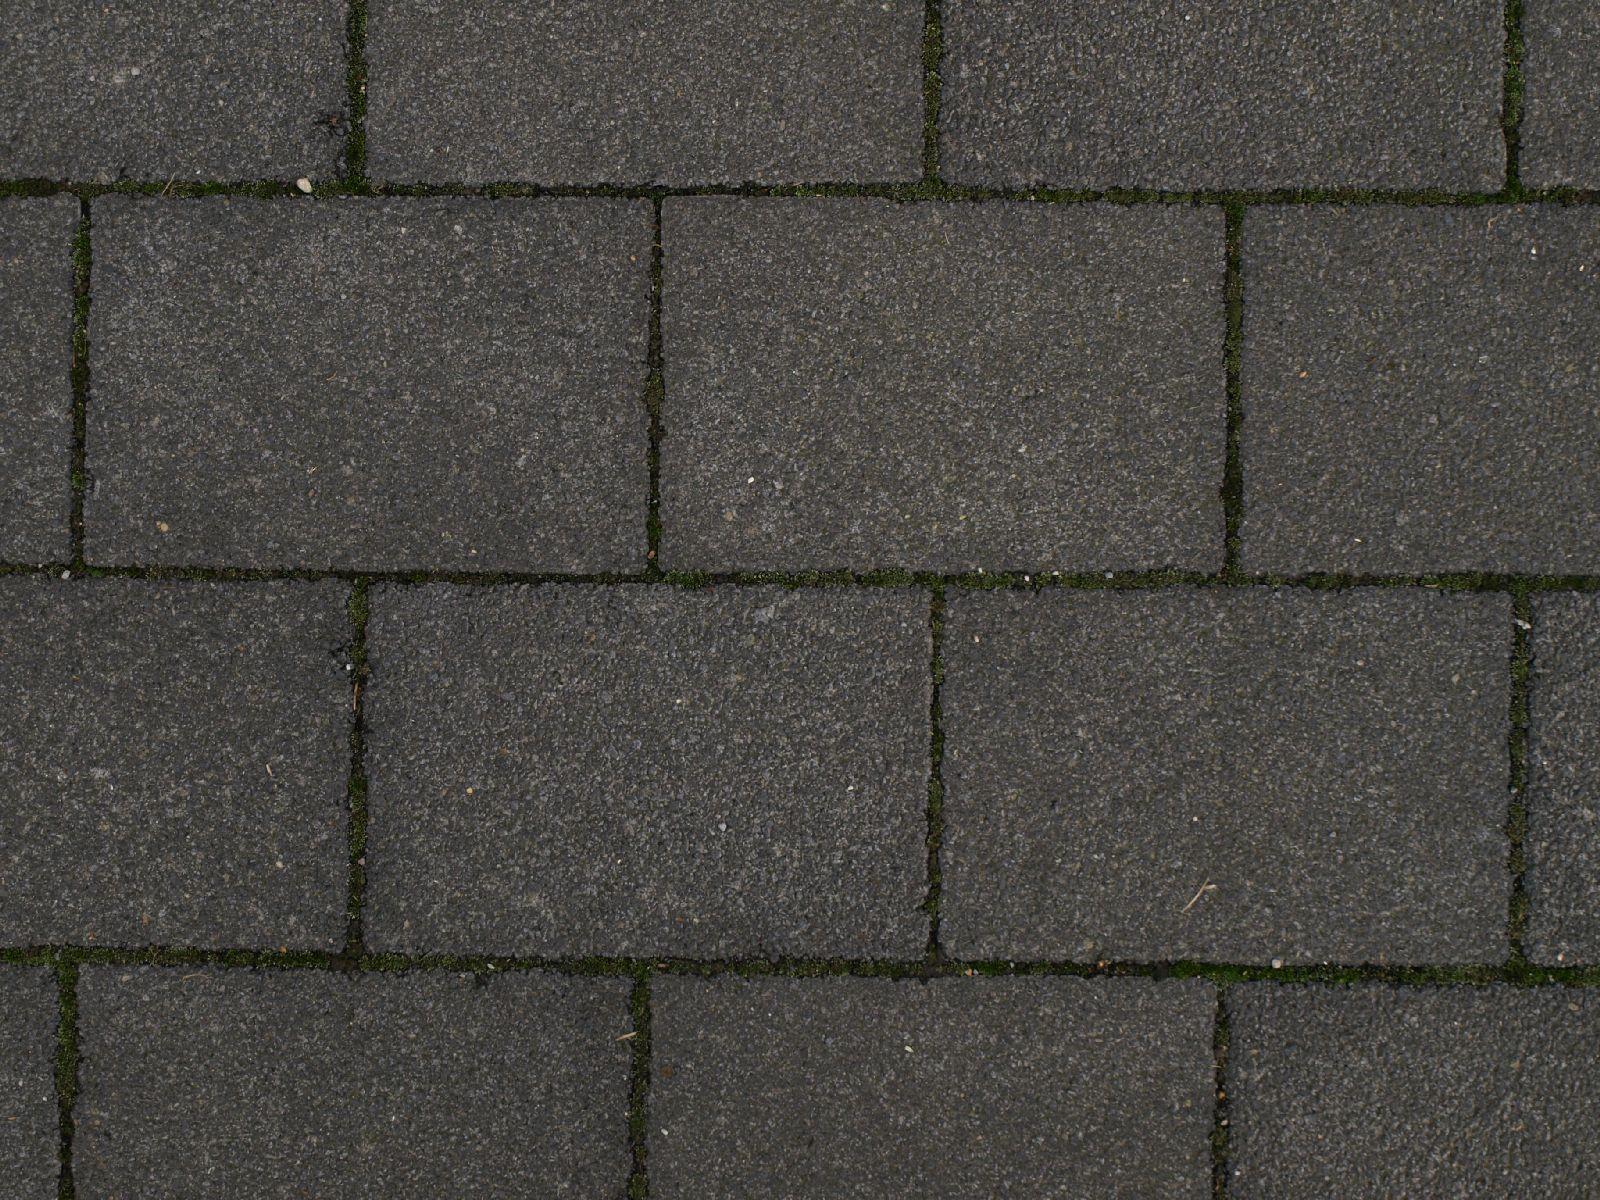 Boden-Gehweg-Strasse-Buergersteig-Textur_A_PA045771